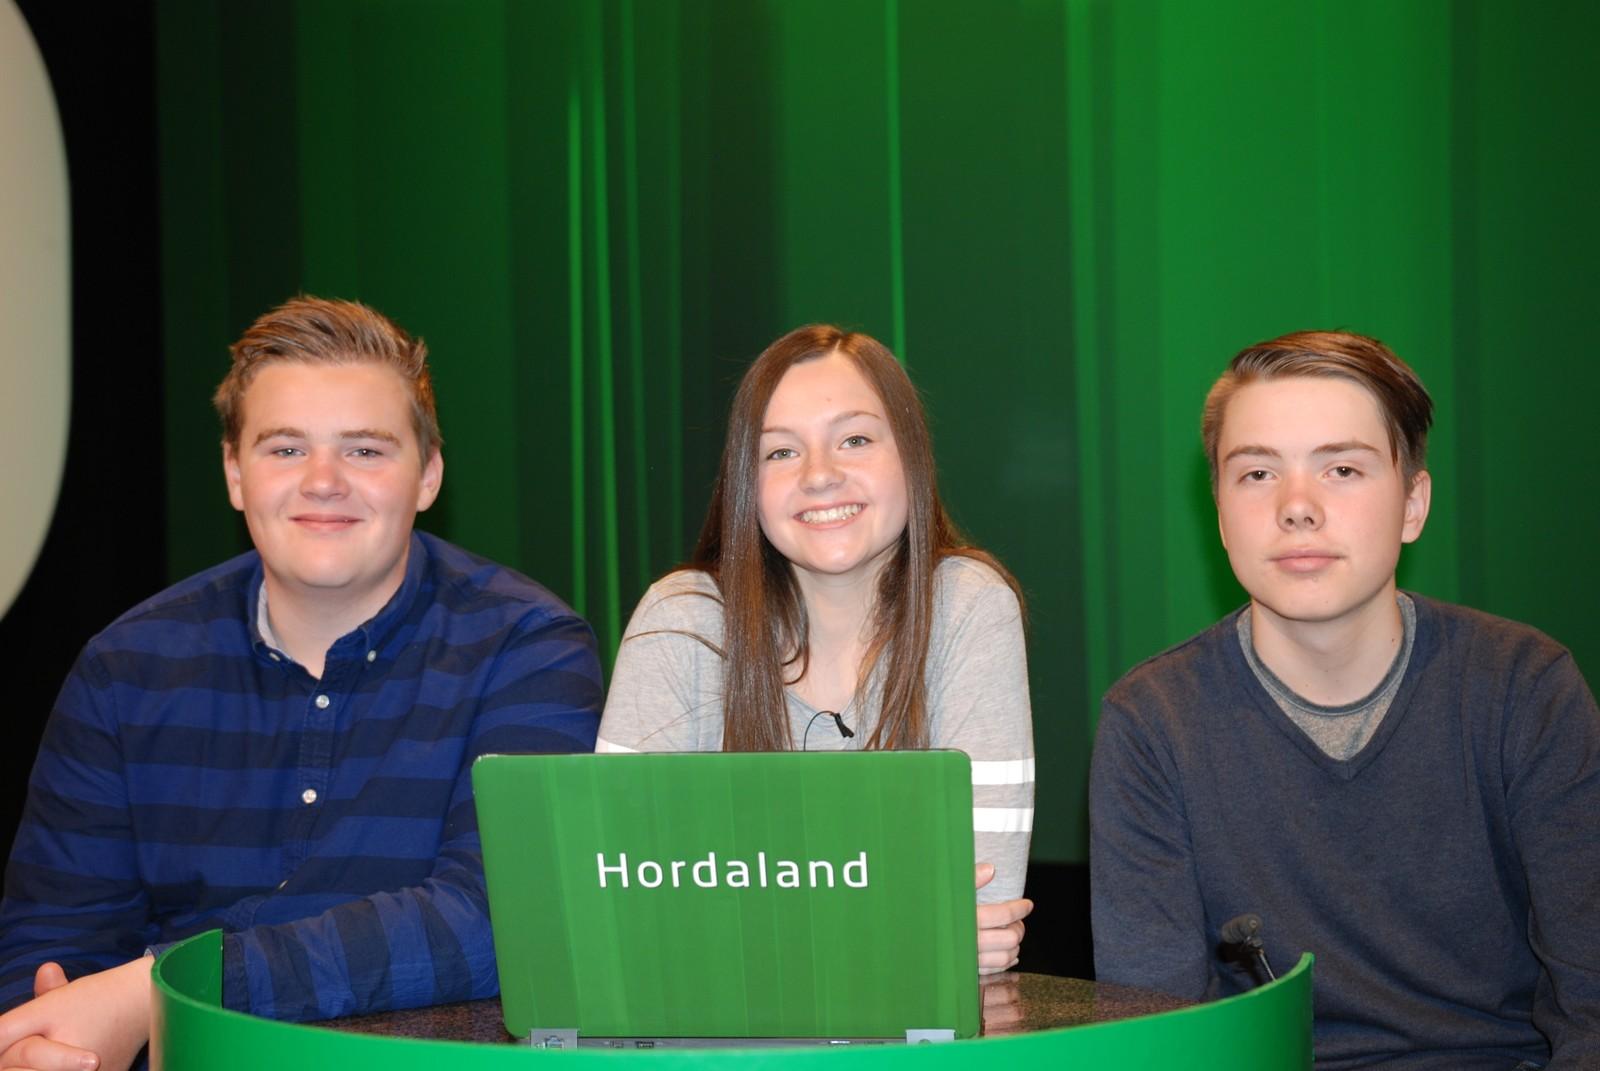 HORDALAND: Meland Ungdomsskule representert ved Sigurd Uthaug, Herman Villanger og Lene Brakstad.